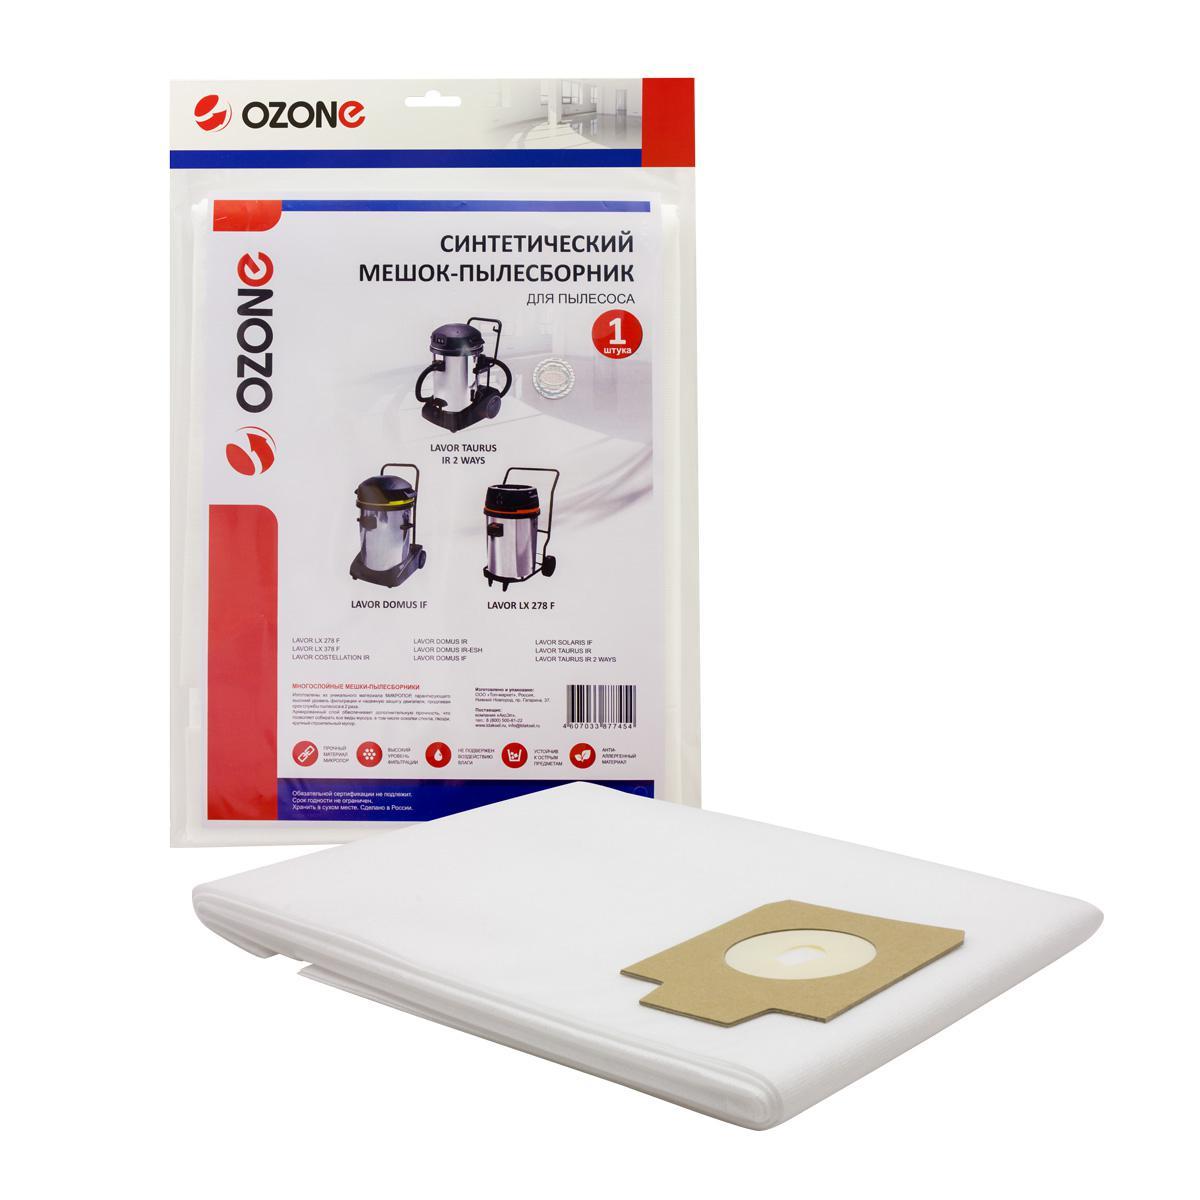 Мешок Ozone Cp-245/1 мешок ozone cp 237 3